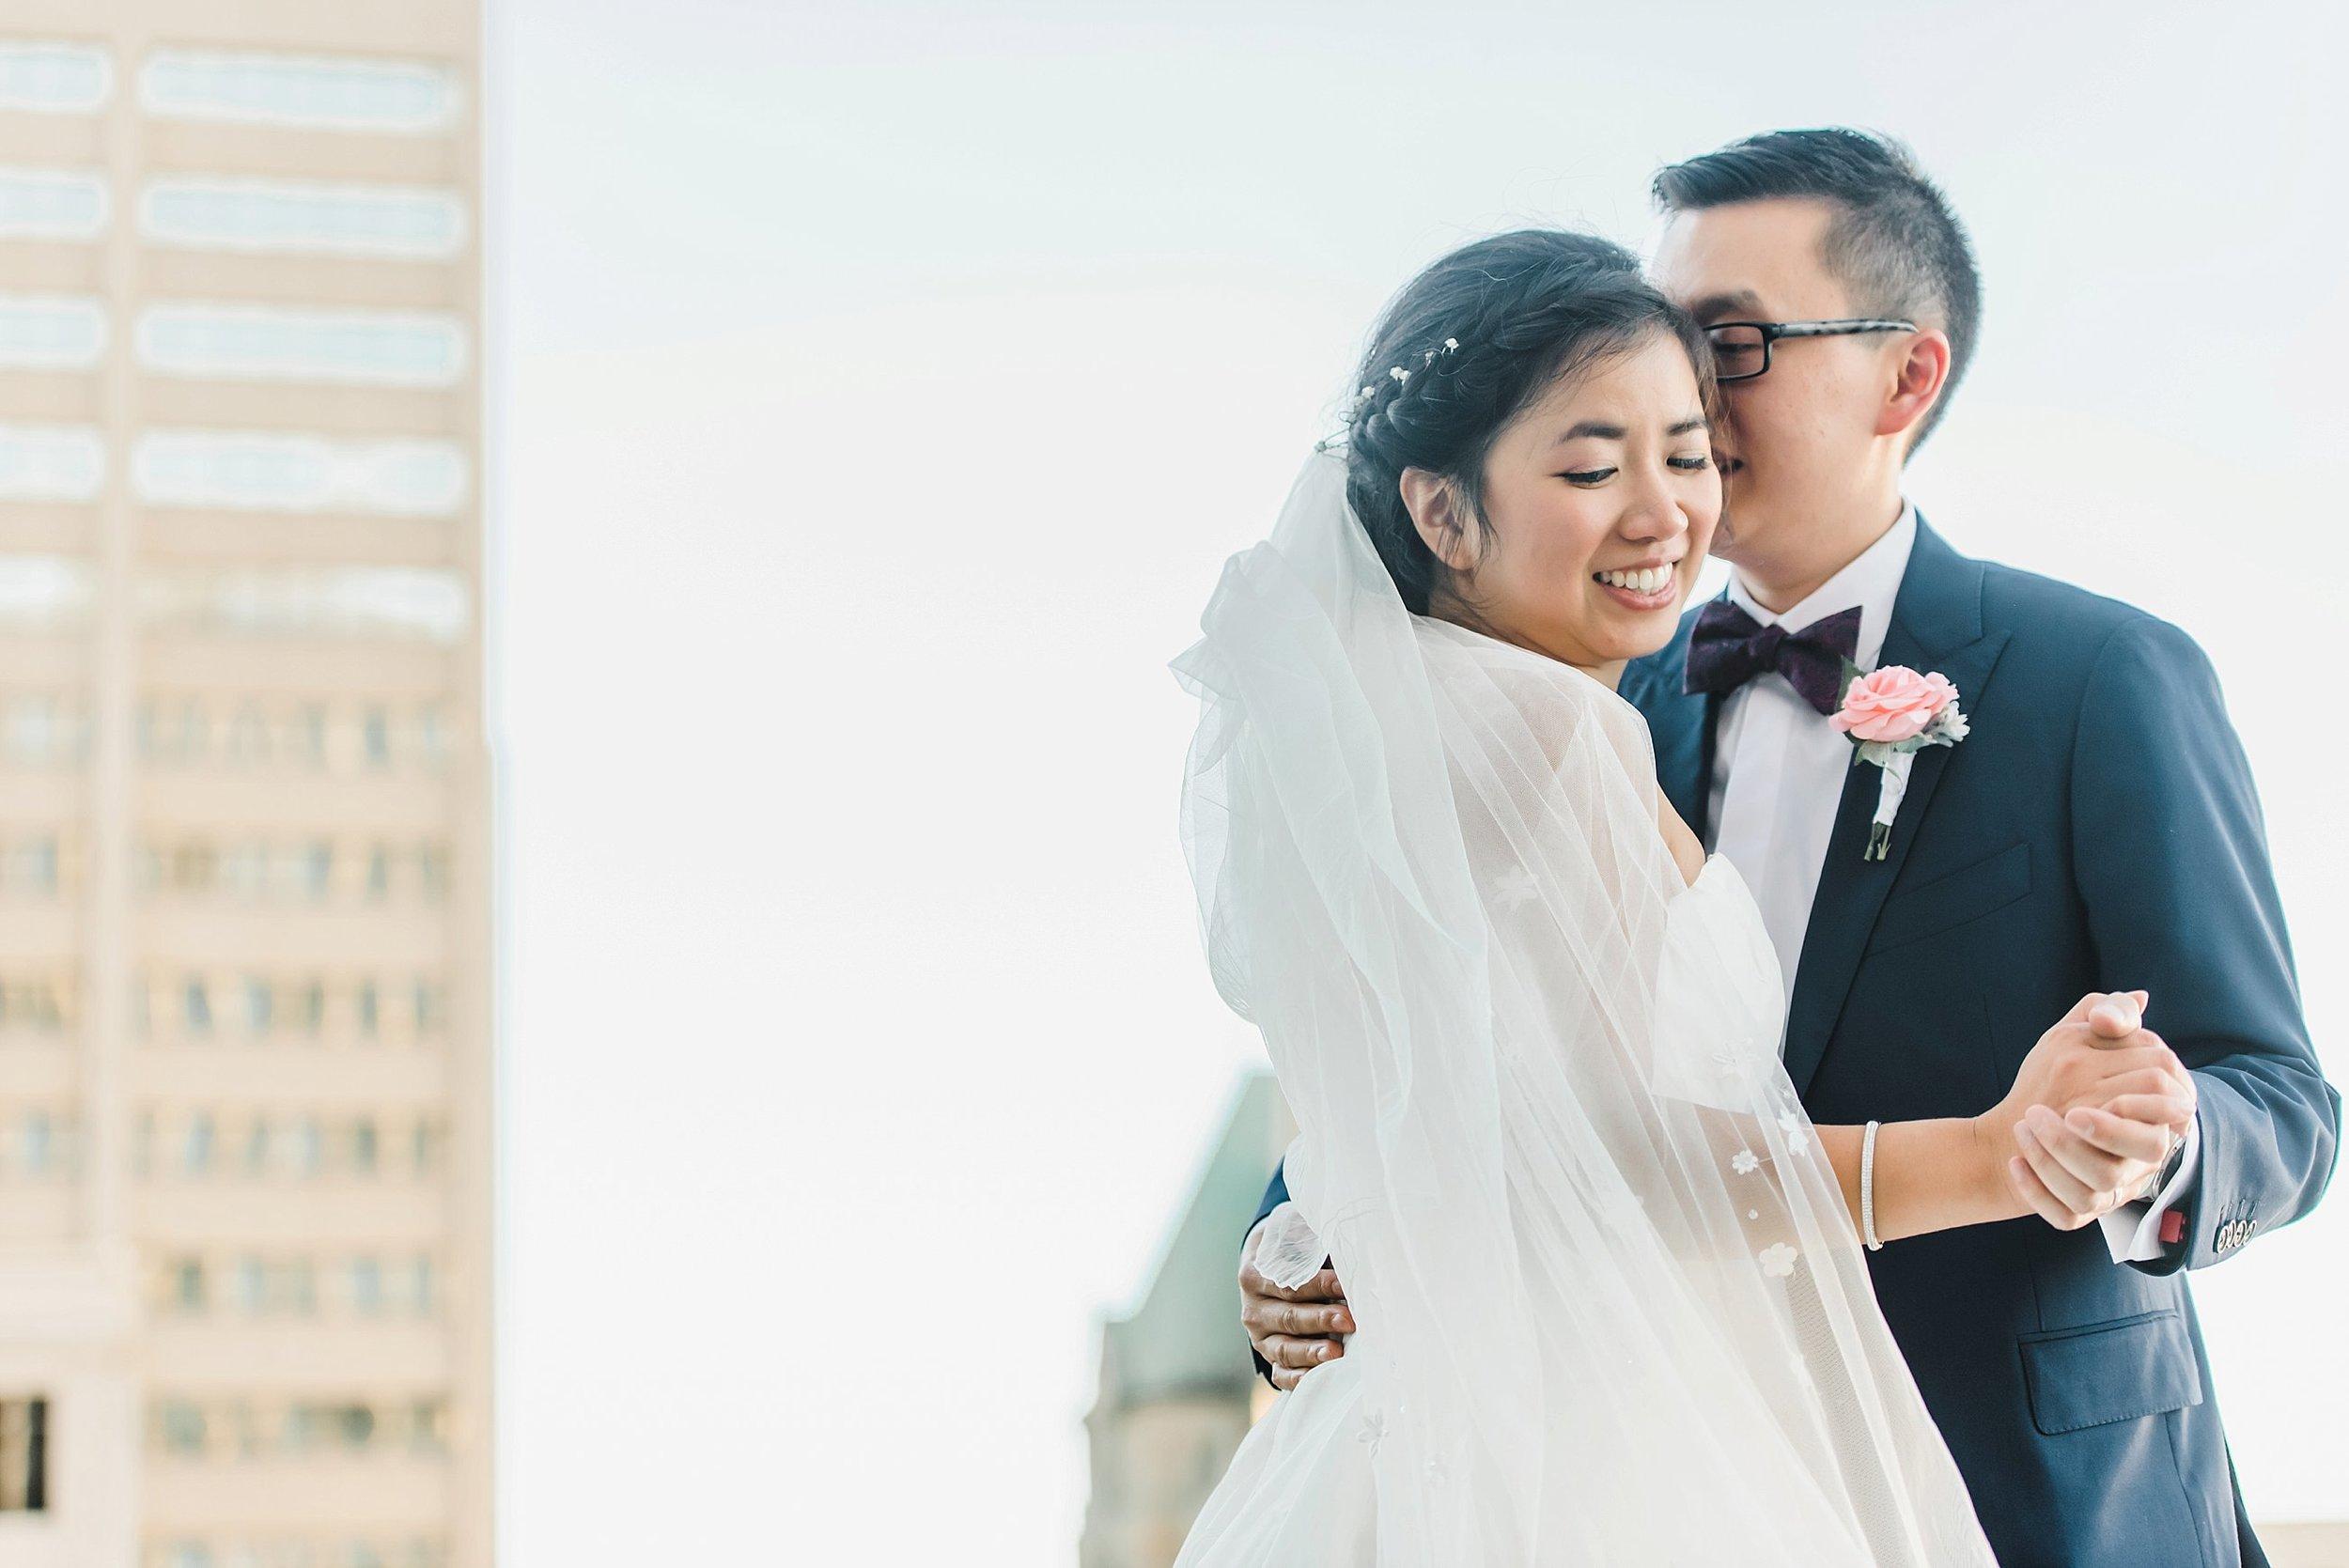 light airy indie fine art ottawa wedding photographer | Ali and Batoul Photography_1527.jpg